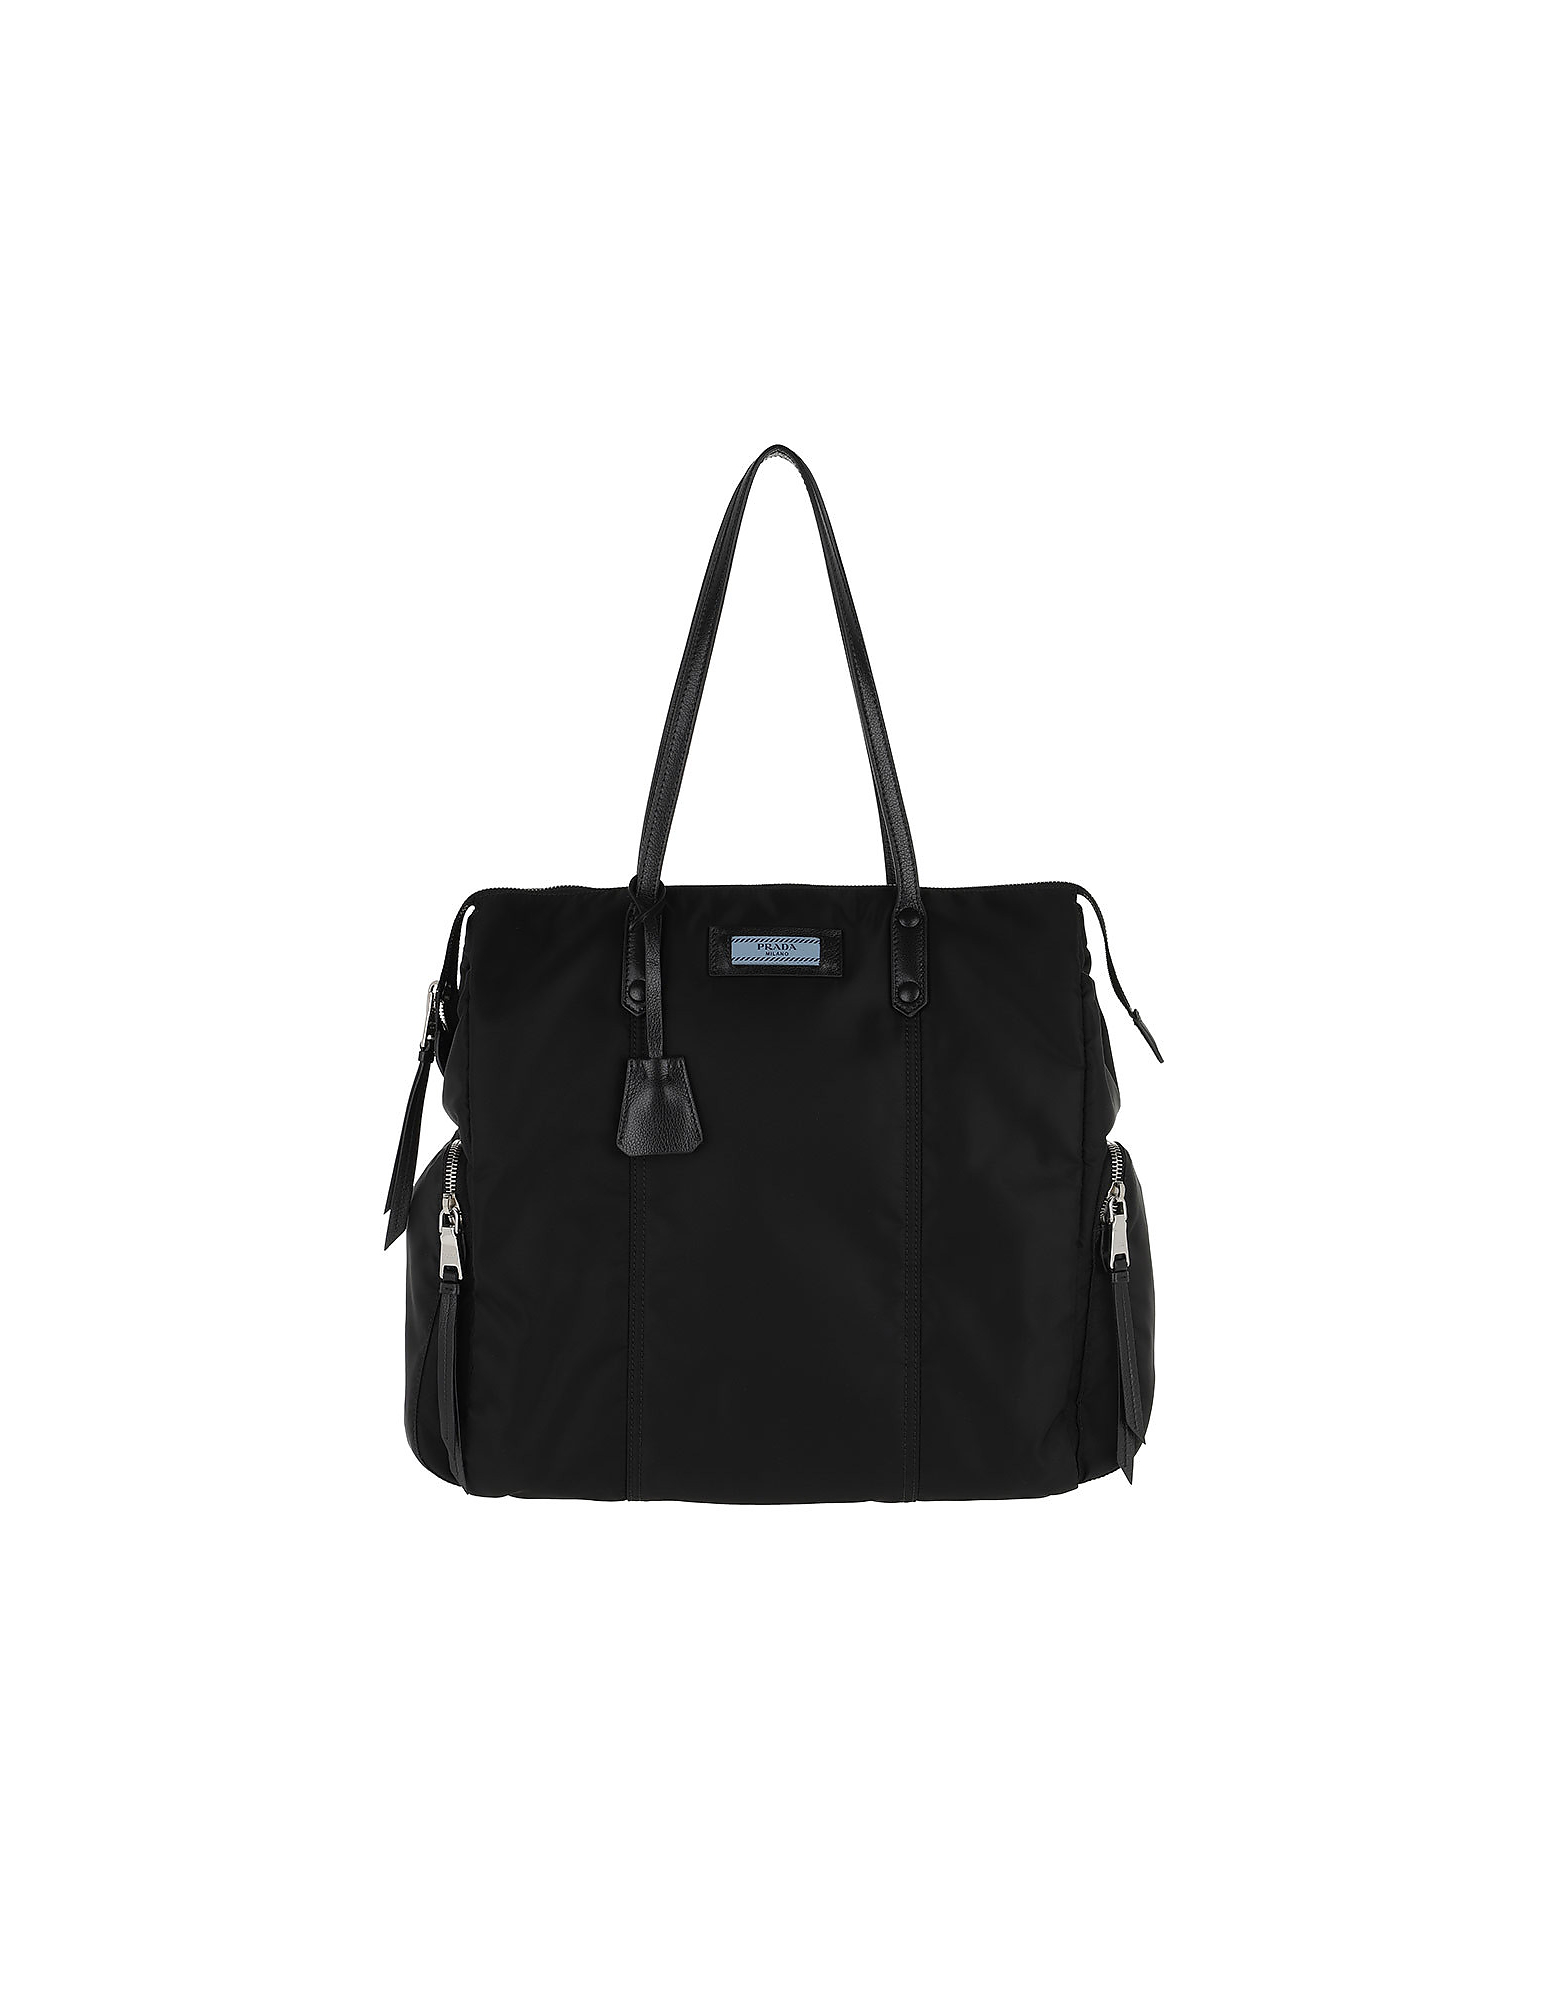 Etiquette Bag Nylon Leather Black